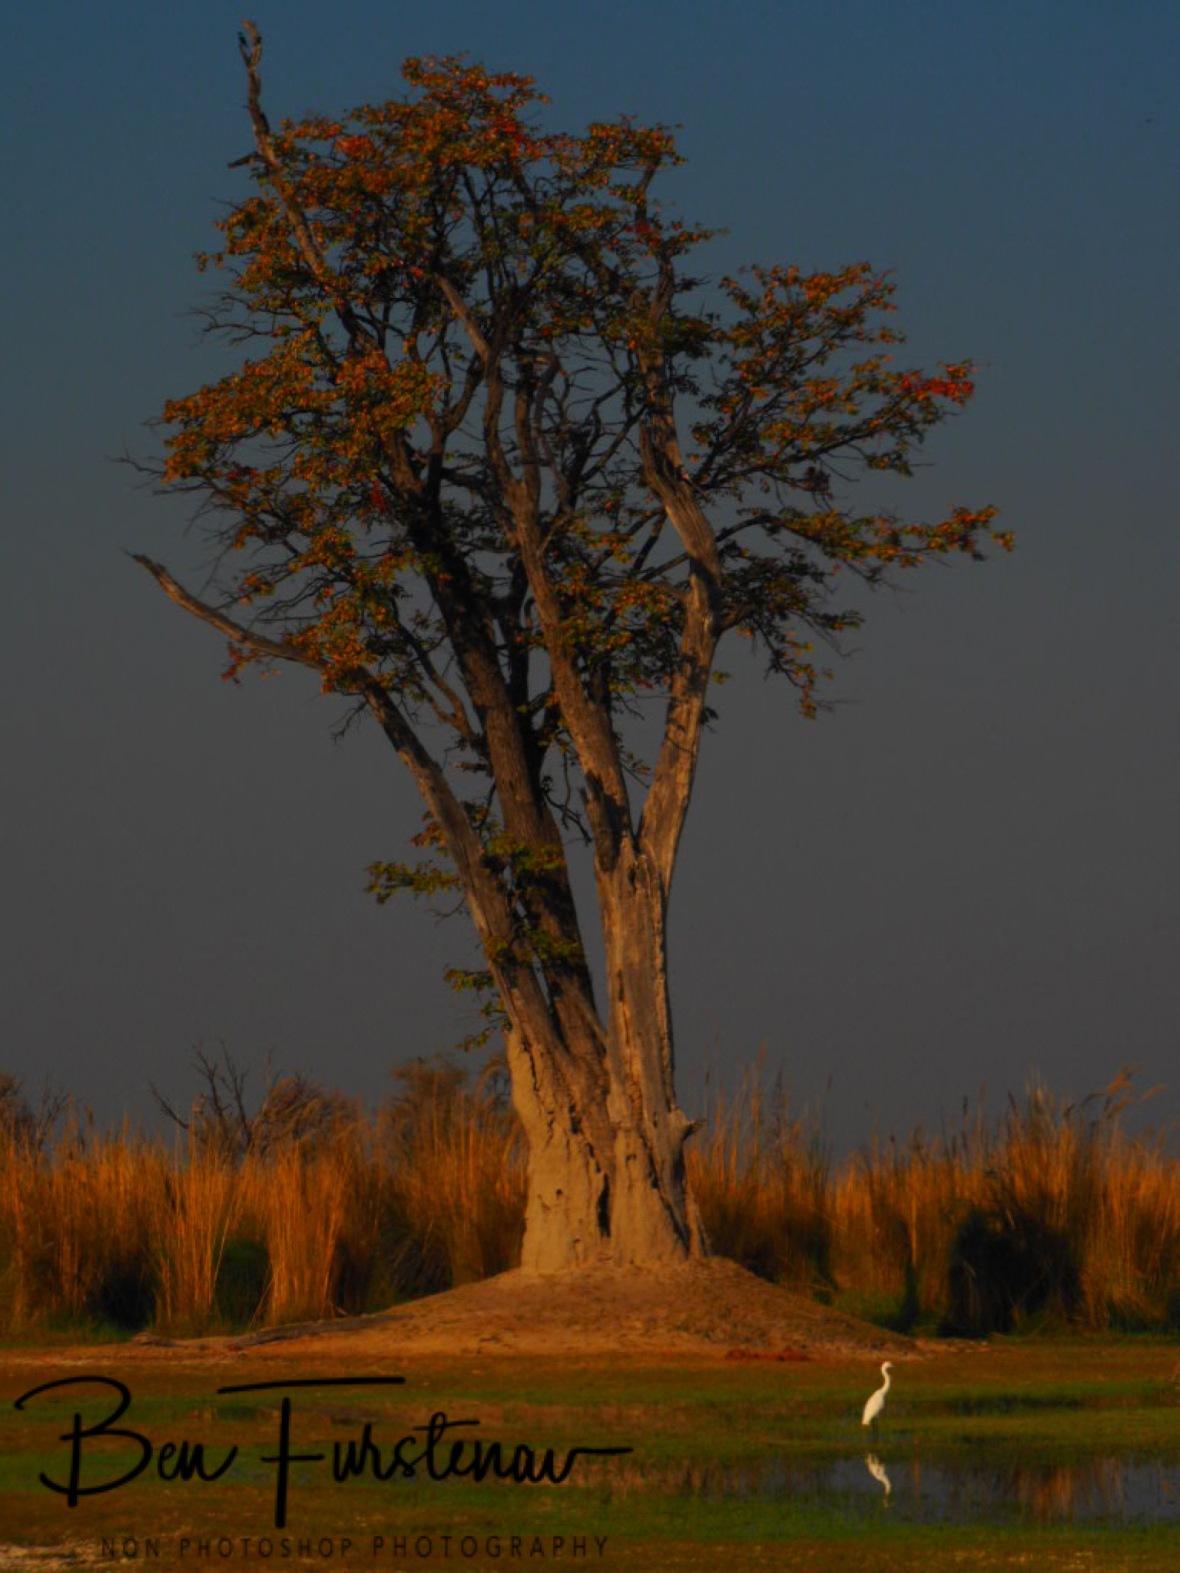 Last outpost before the swamp, paradise pools, Moremi National Park, Okavango Delta, Botswana